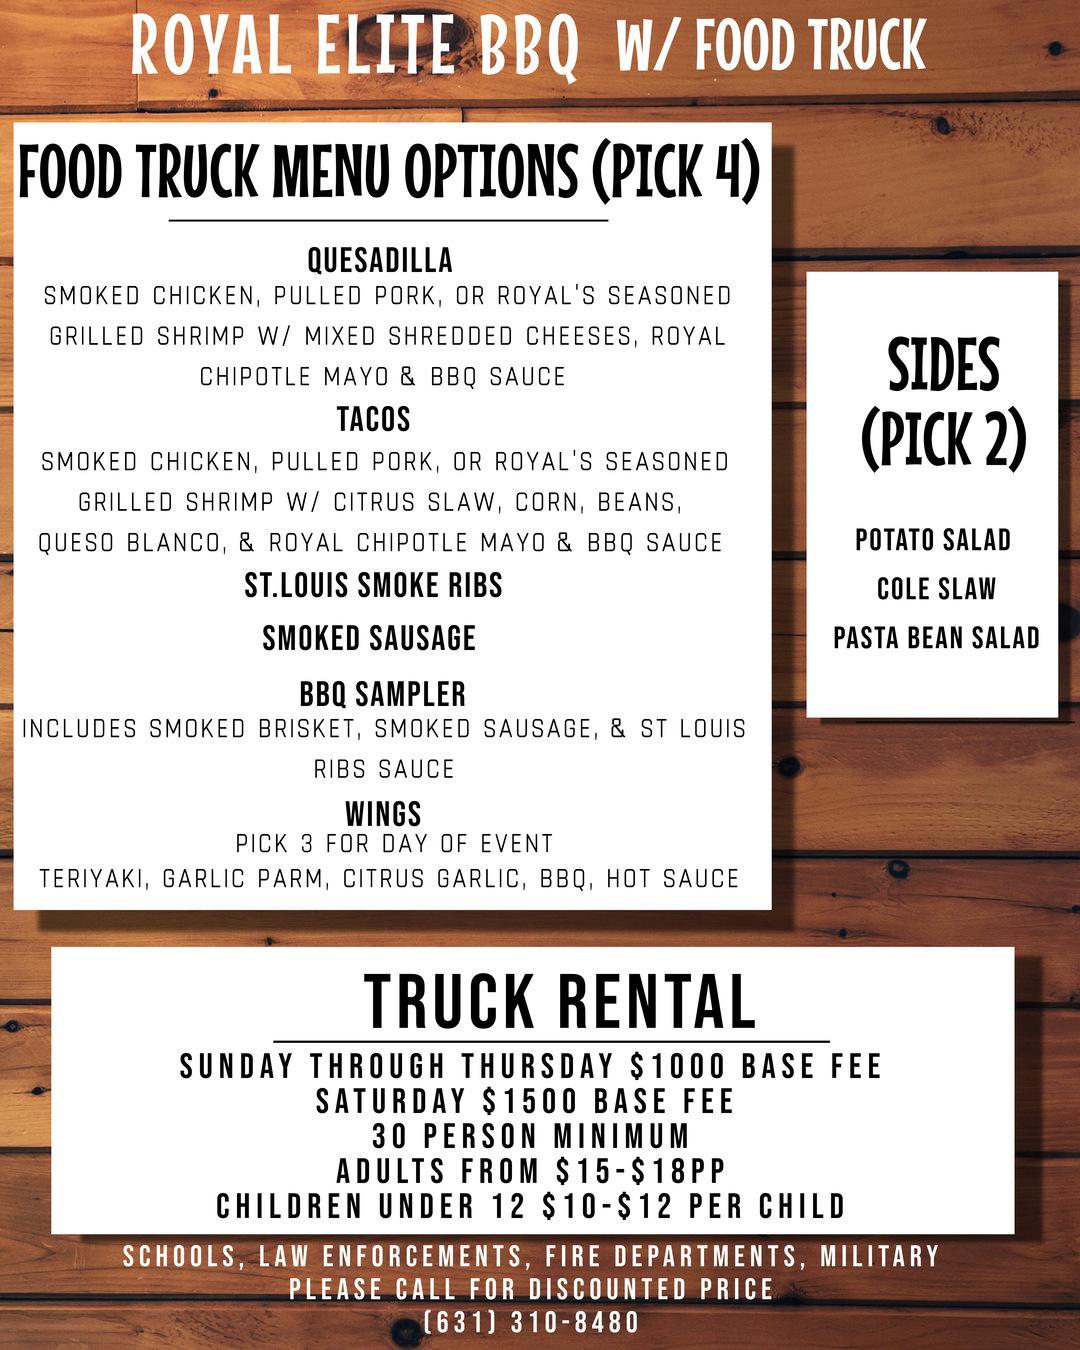 Royal Elite Full Service Food Truck Catering Menu.jpg